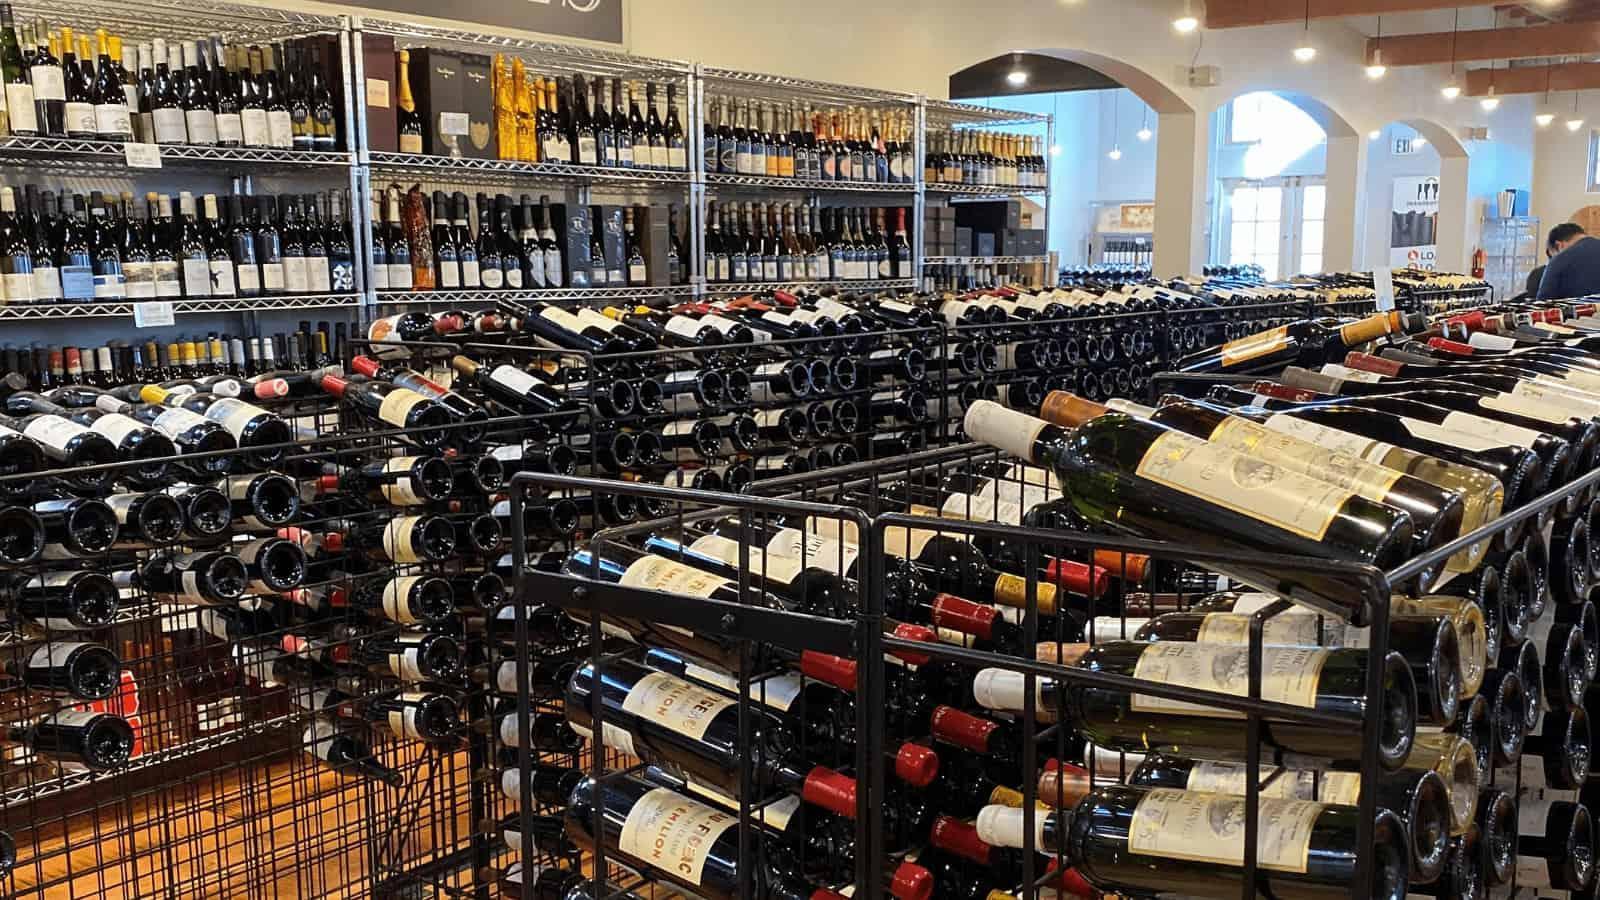 Gary's Wine & Marketplace